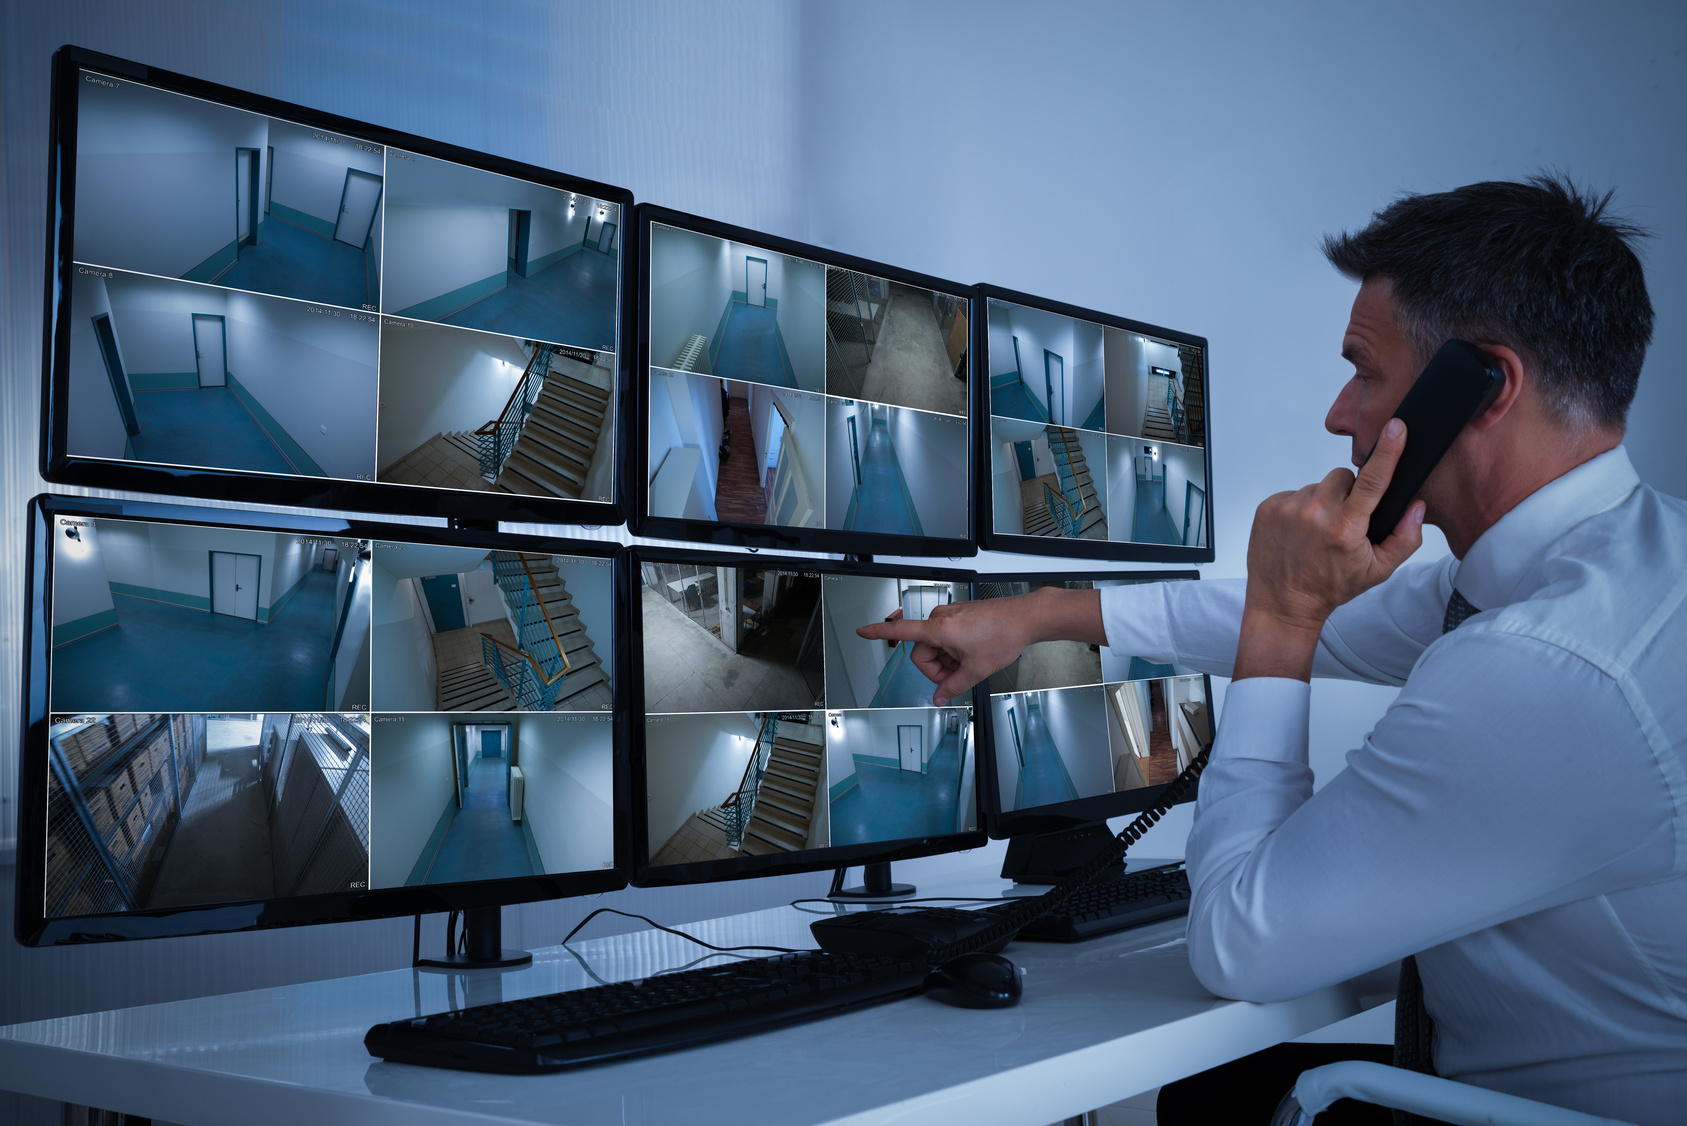 Sytème de télésurveillance par imaya protect